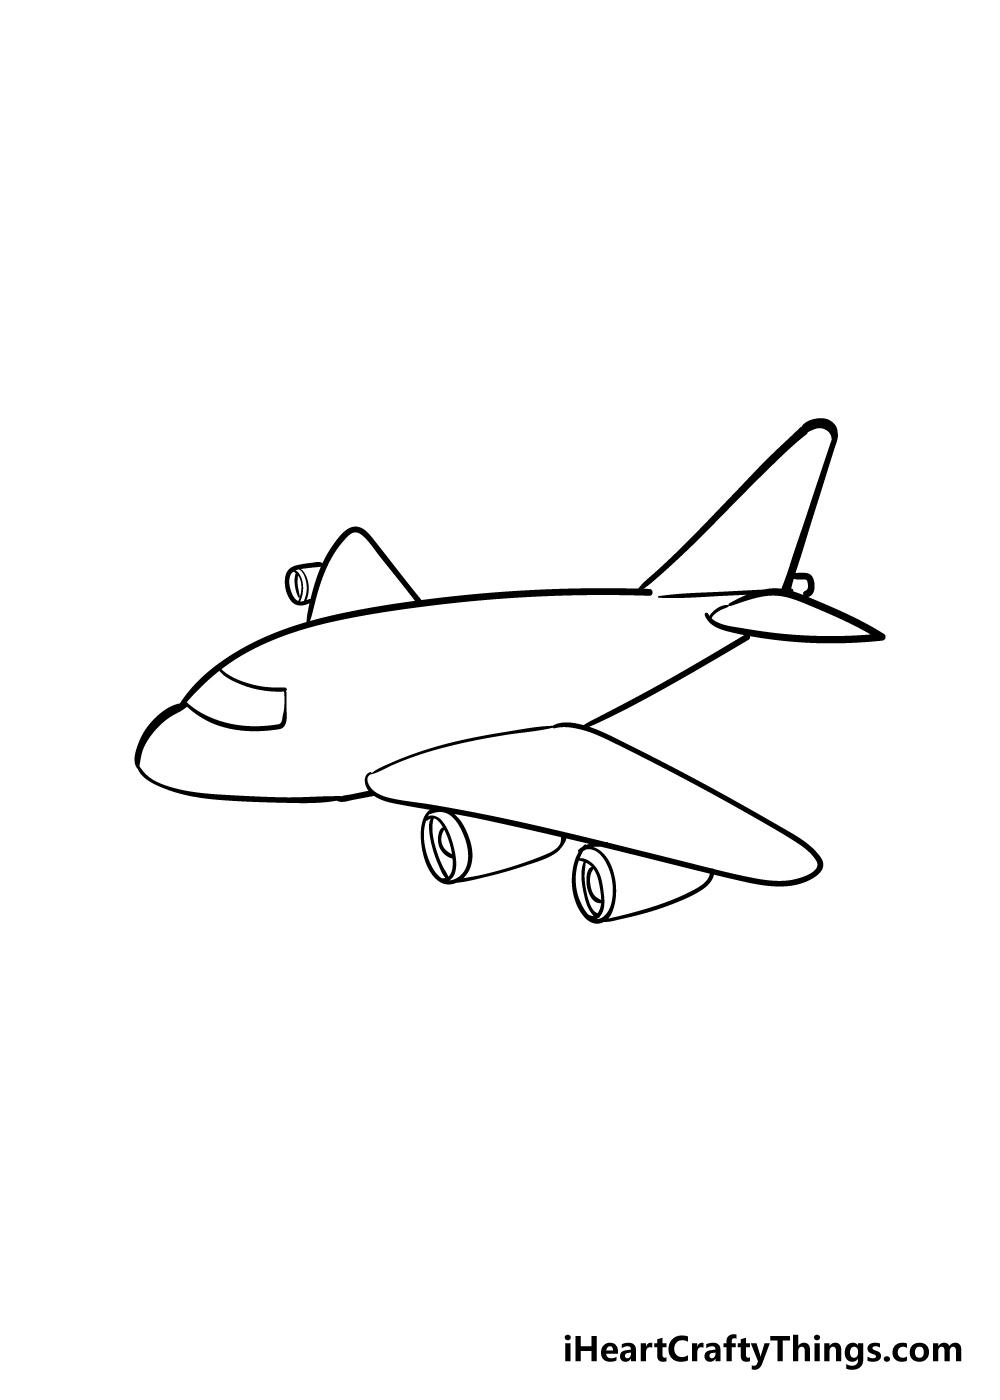 airplane drawing step 5